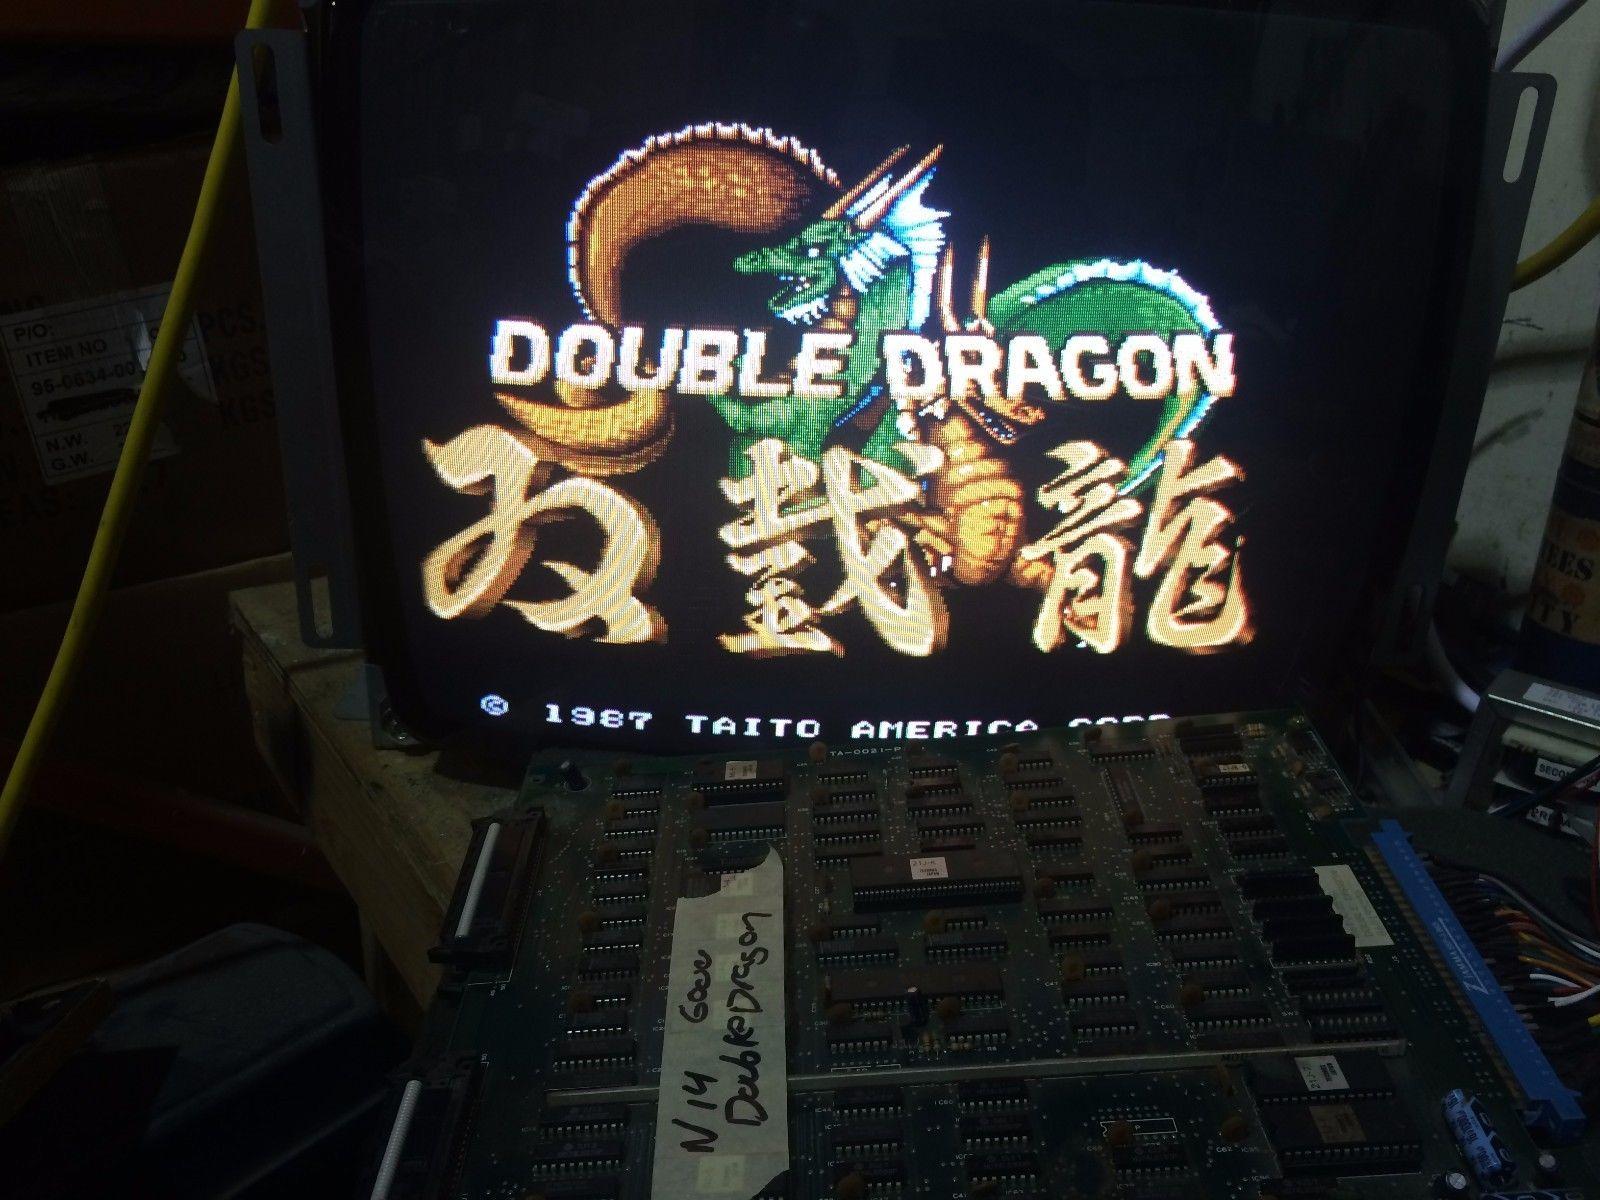 Technos Double Dragon Arcade Game Pcb Circuit Board N14 Vintage Games